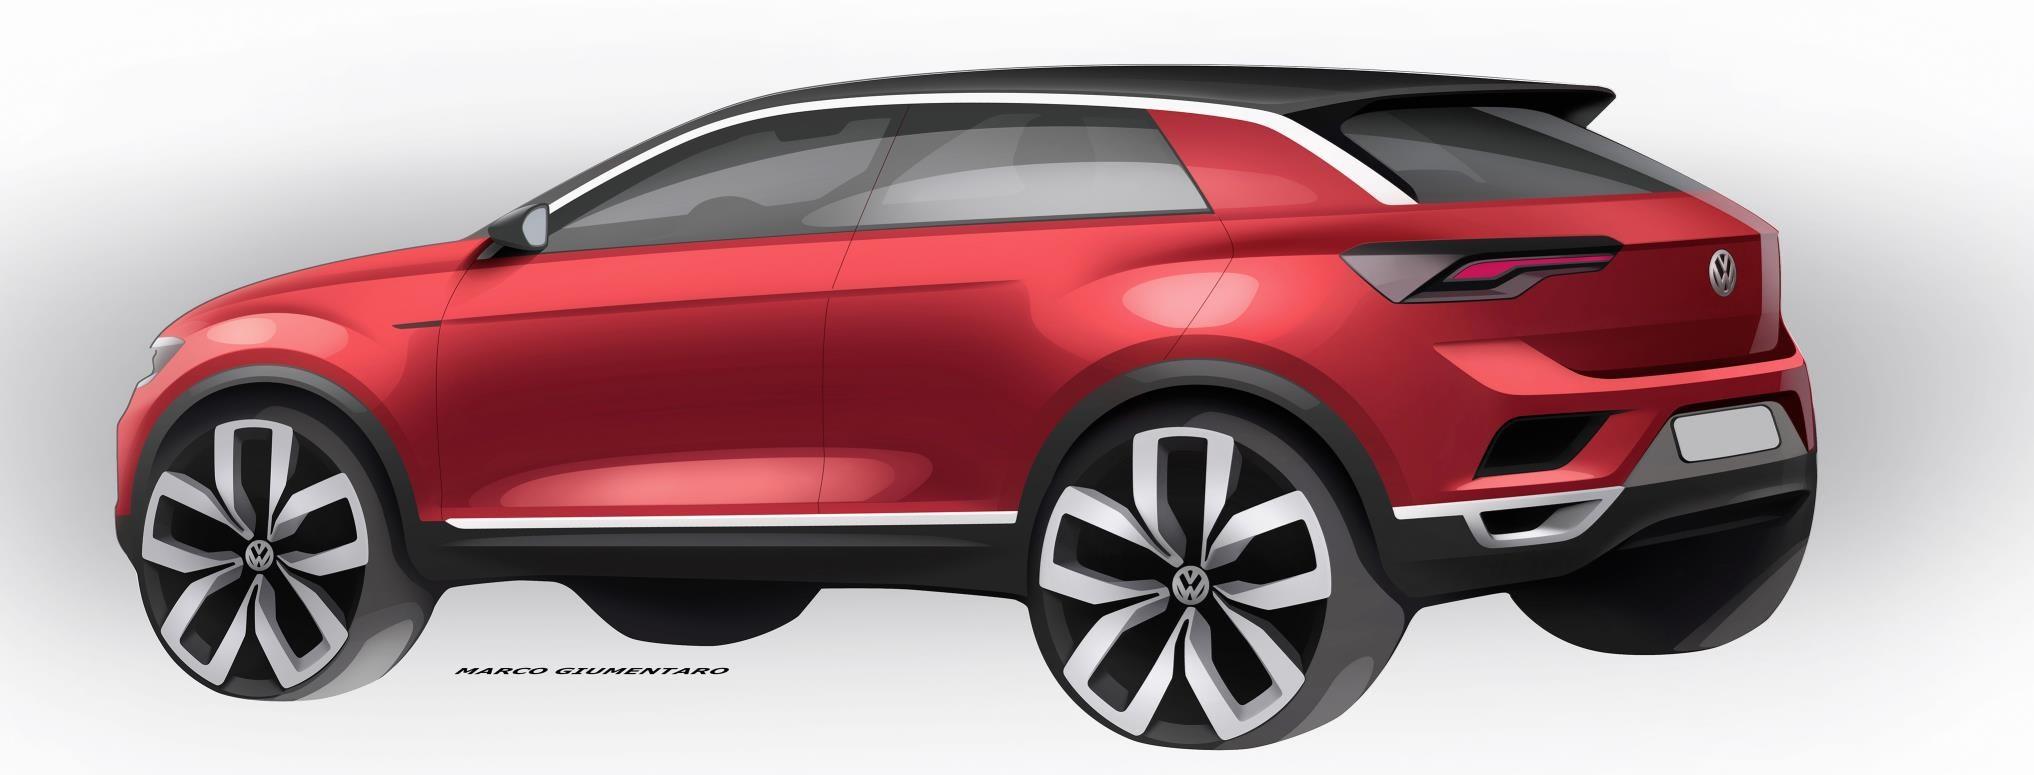 vw t roc revealed news photos specs prices car magazine. Black Bedroom Furniture Sets. Home Design Ideas